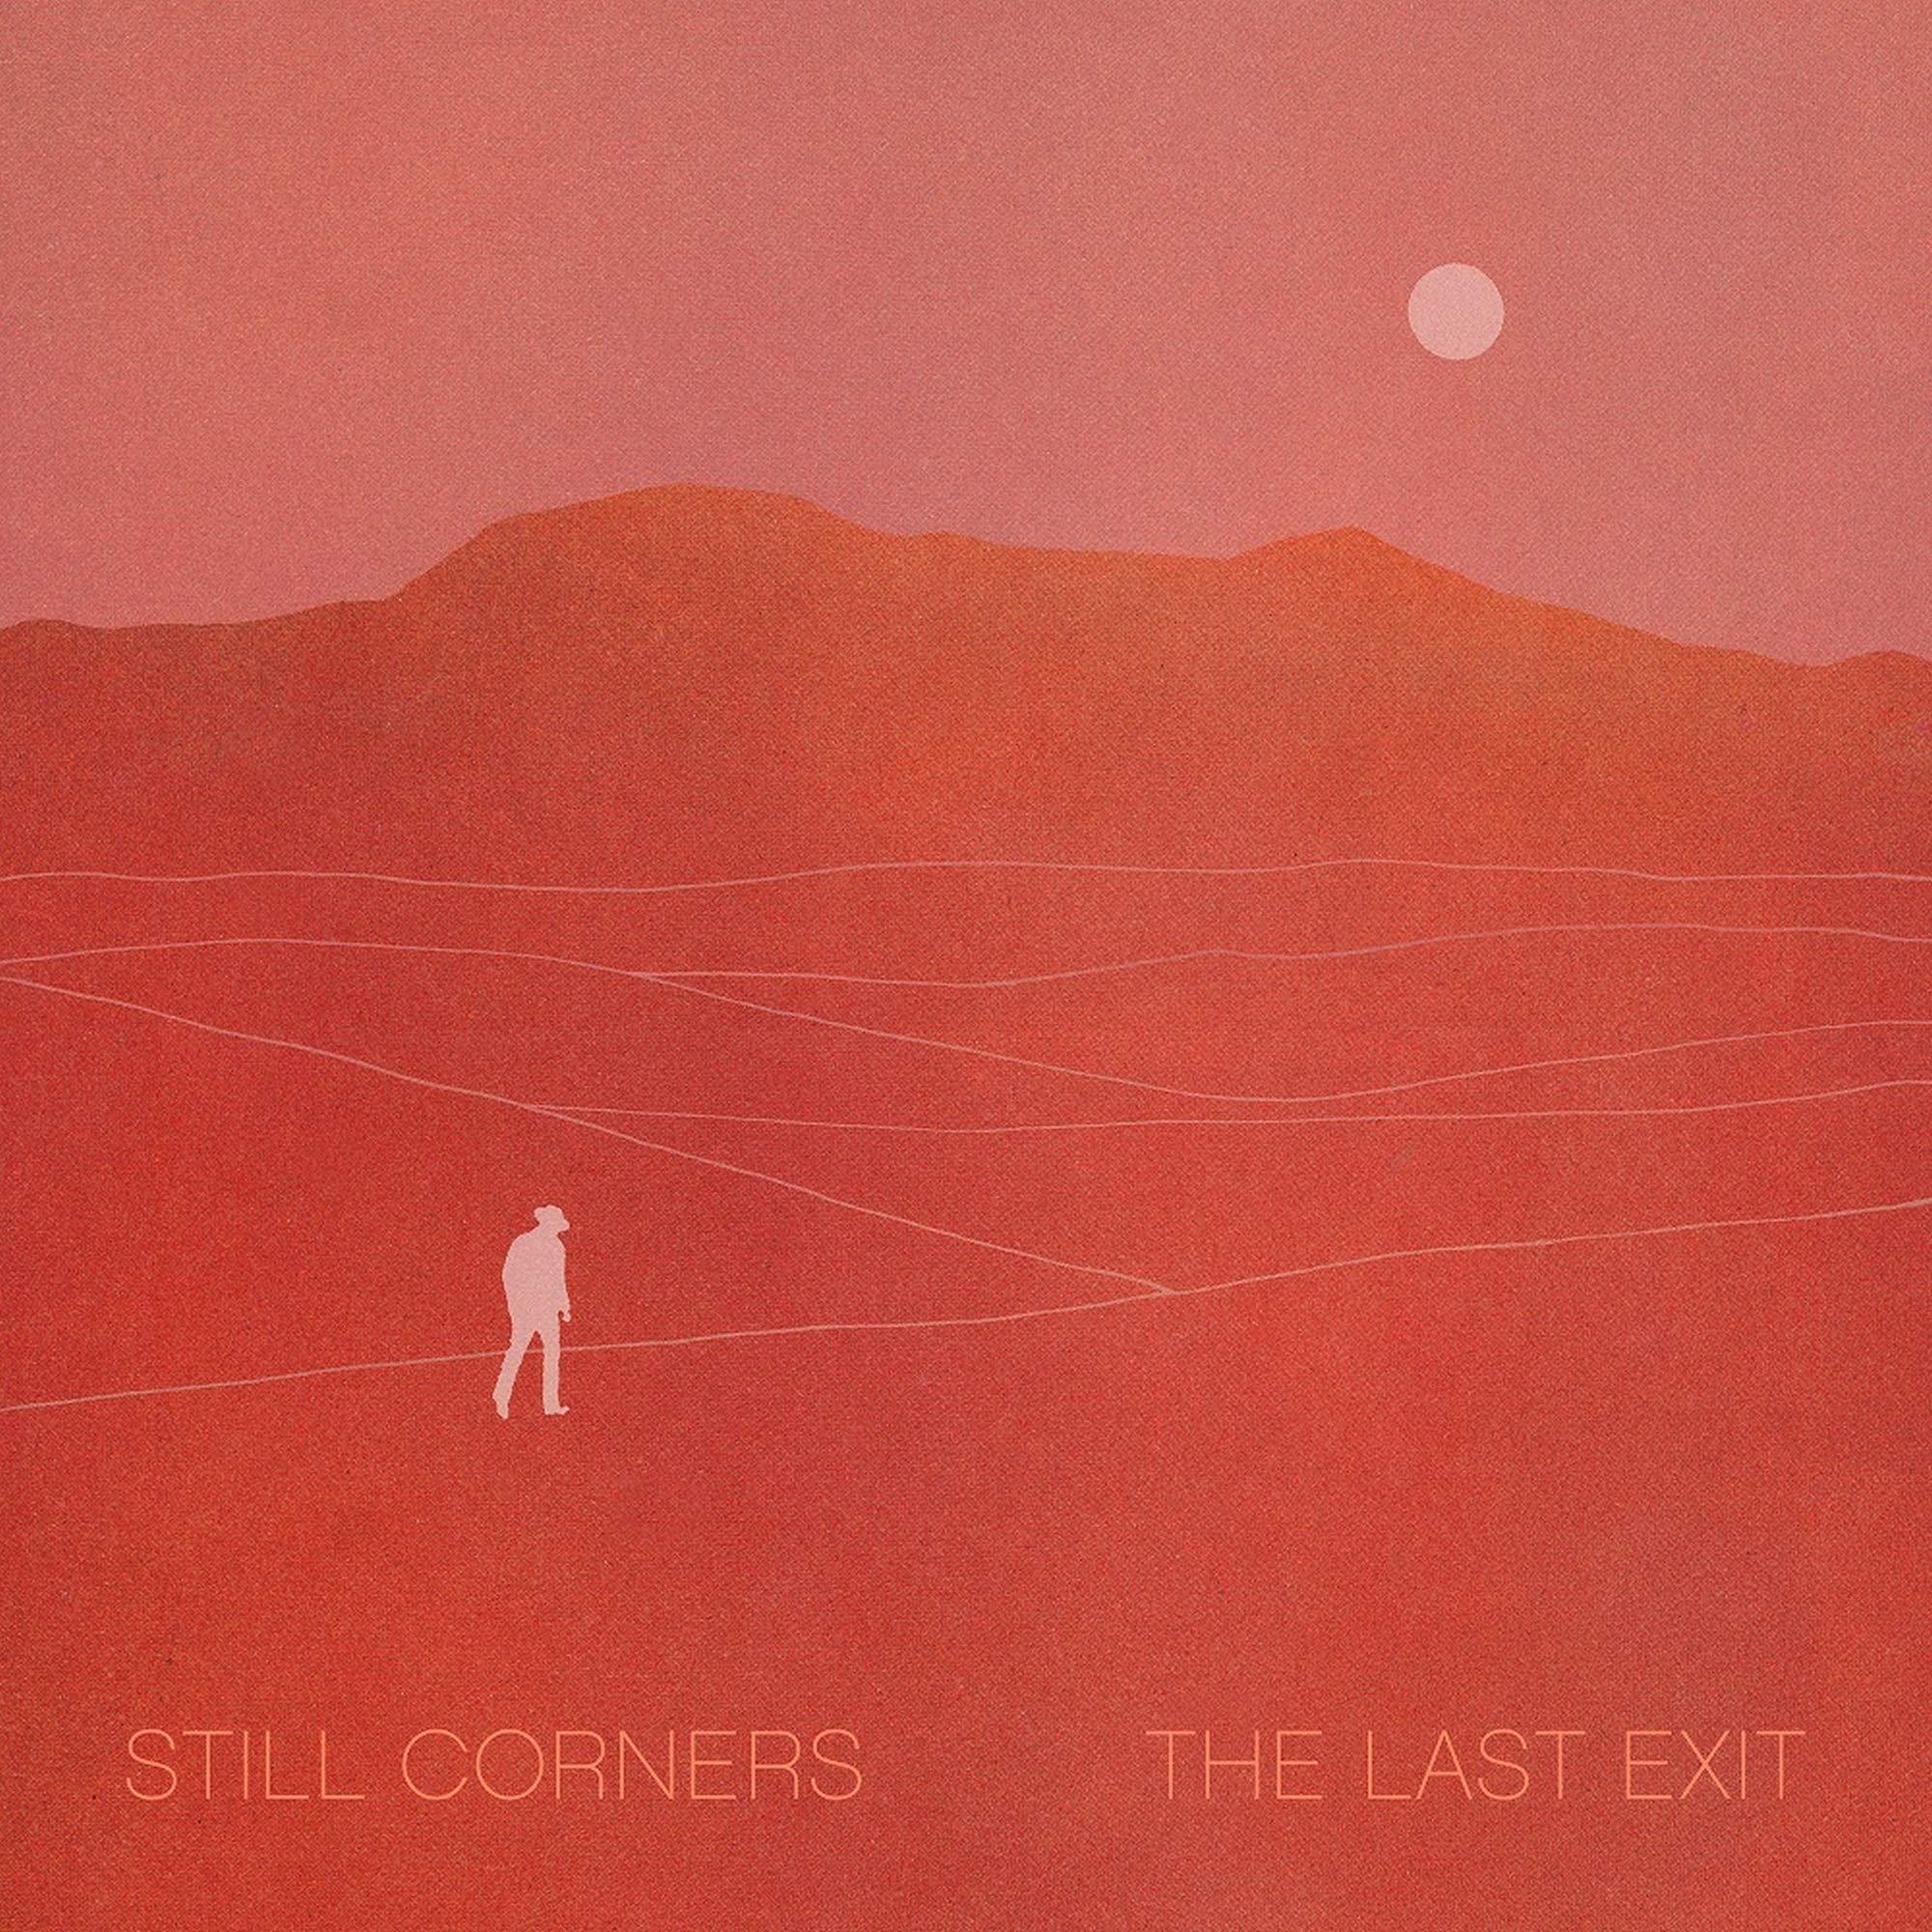 Still Corners - The Last Exit (2021) [FLAC] Download